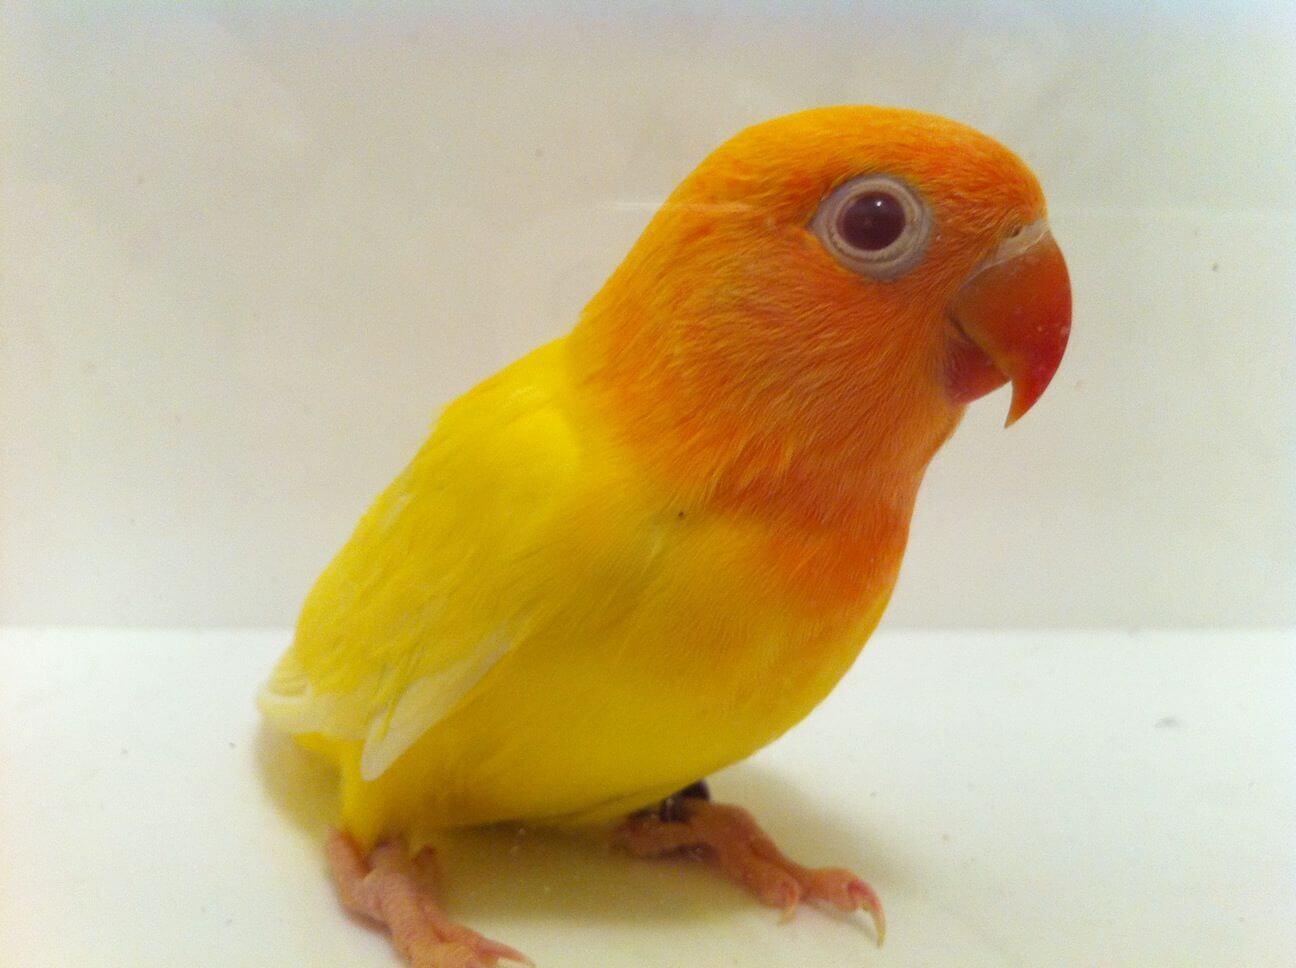 Daftar Harga Lovebird Lutino Mata Merah